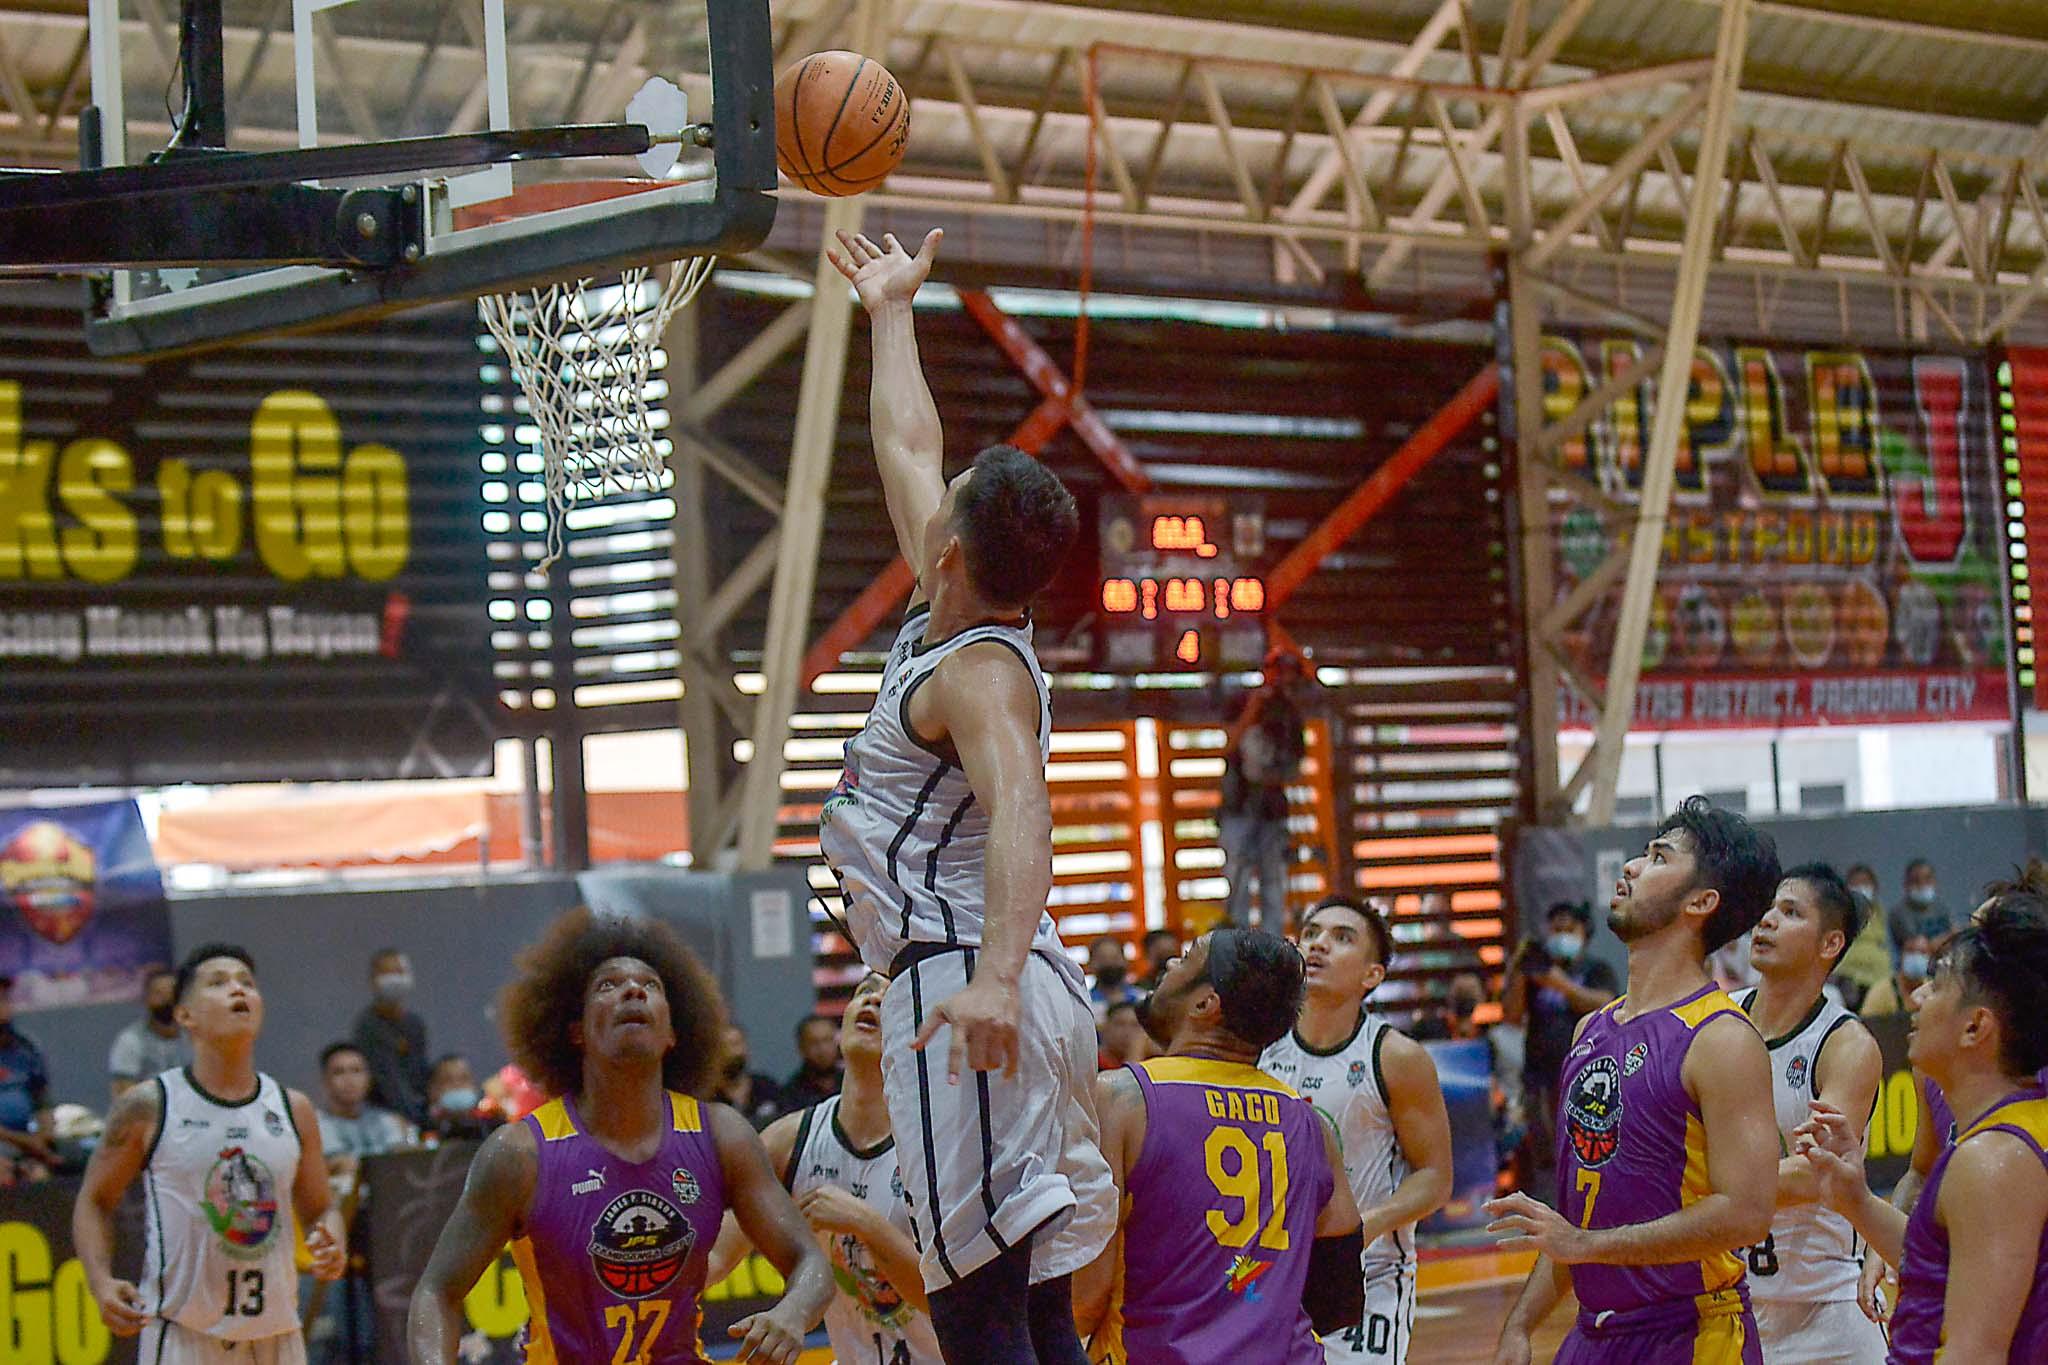 2021-Chooks-to-Go-VisMin-Roxas-vs-Zamboanga-City-Lester-Reyes-Game-winner Lester Reyes knocks down buzzer-beater as Roxas stuns Zambo City in VisMin Basketball News VisMin Super Cup  - philippine sports news